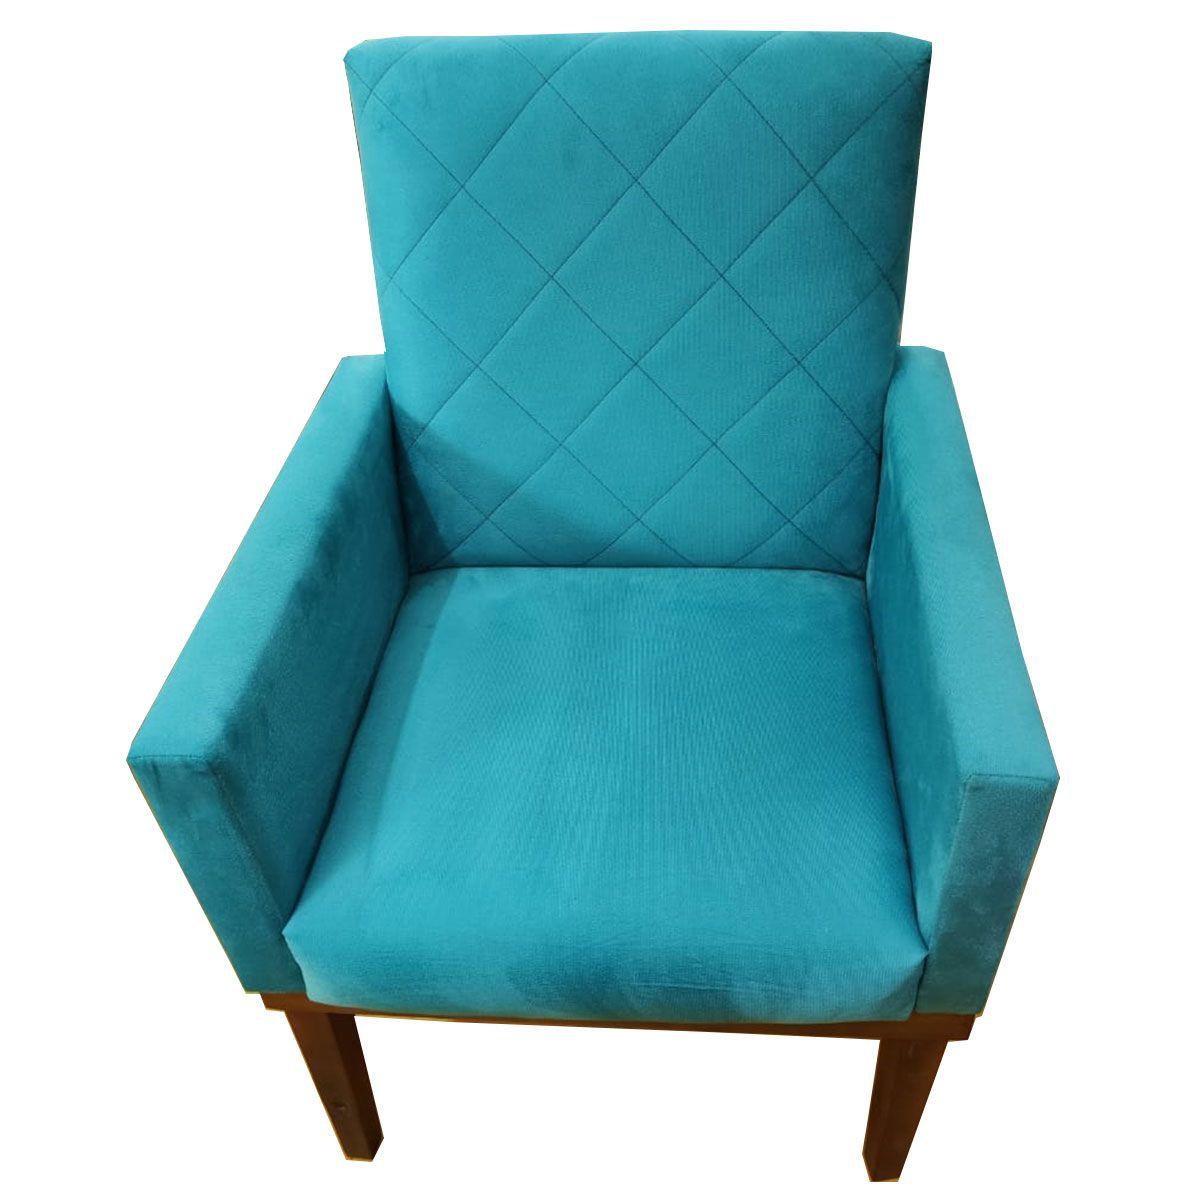 Poltrona Decorativa Beatriz Base Madeira Azul Turquesa